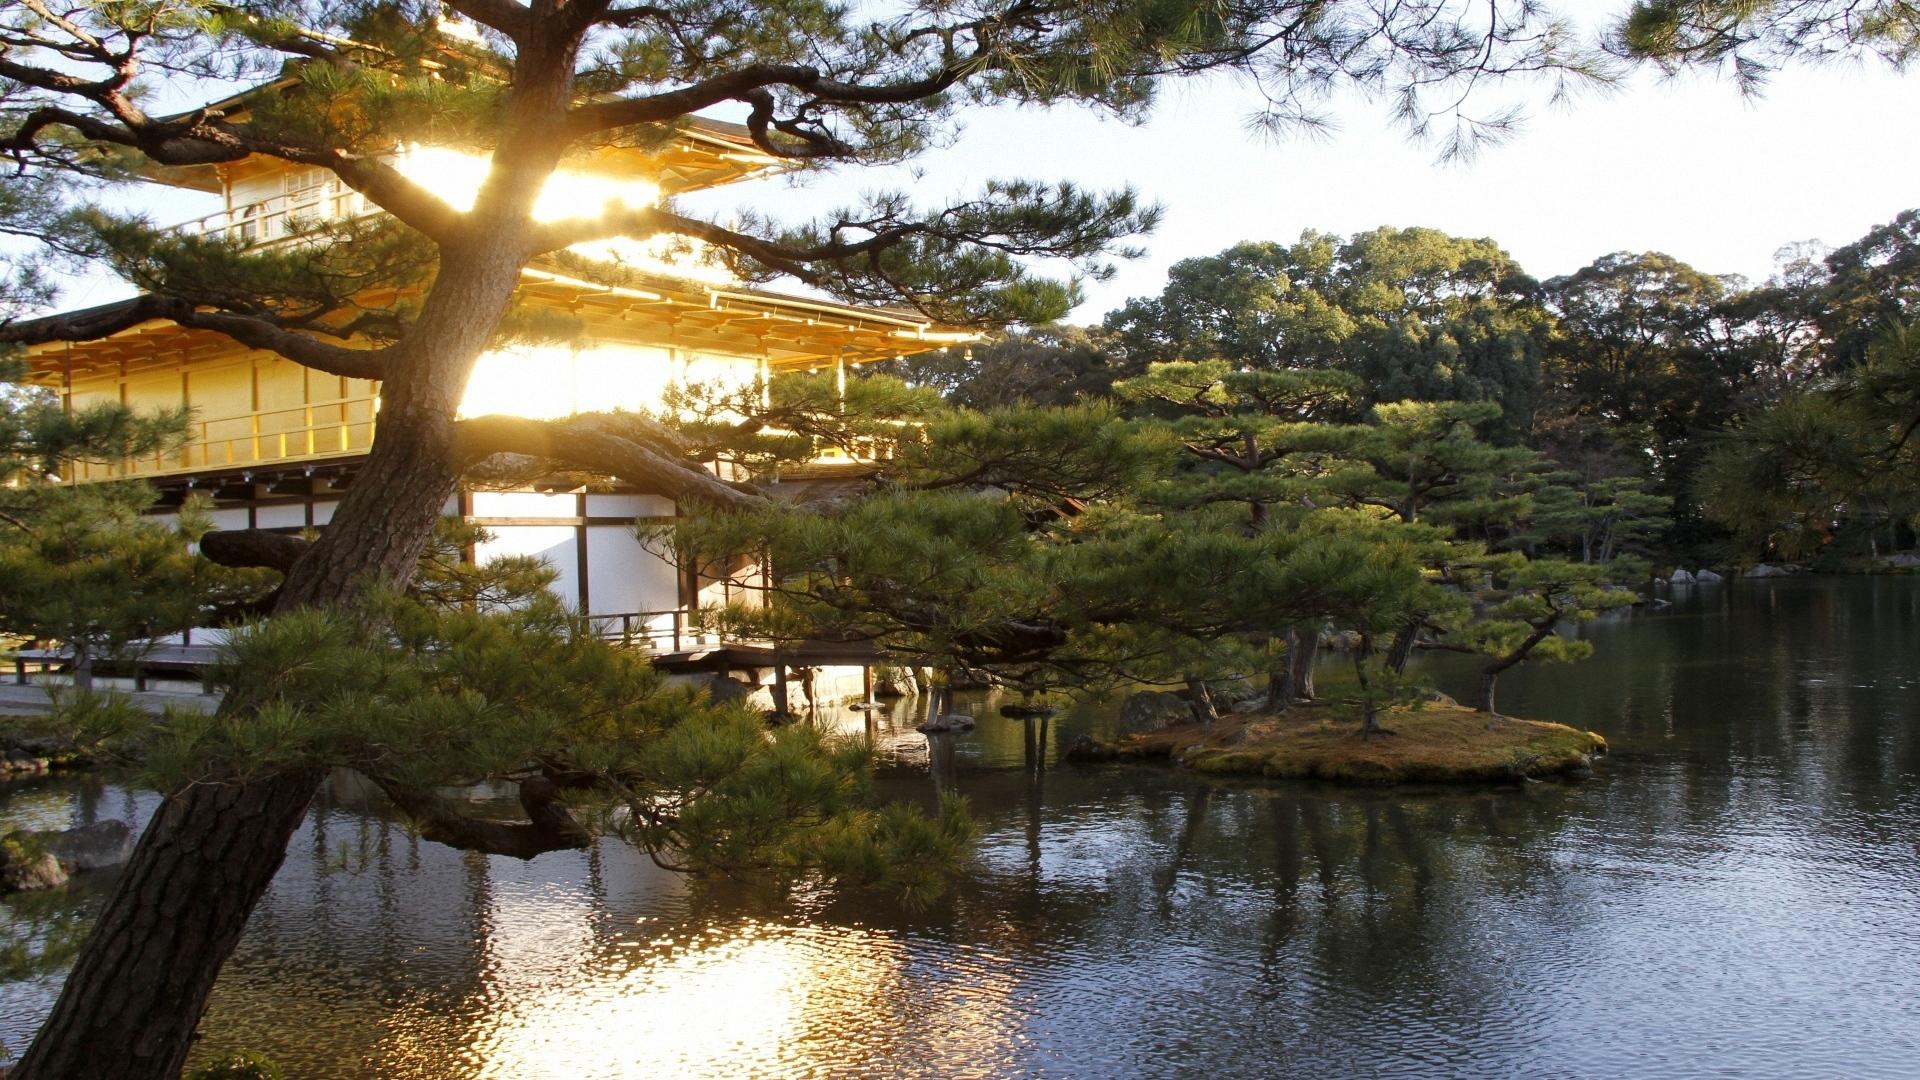 Hd Japan Wallpapers 1080p: Download Wallpaper 1920x1080 Evening, Japan, Mansion